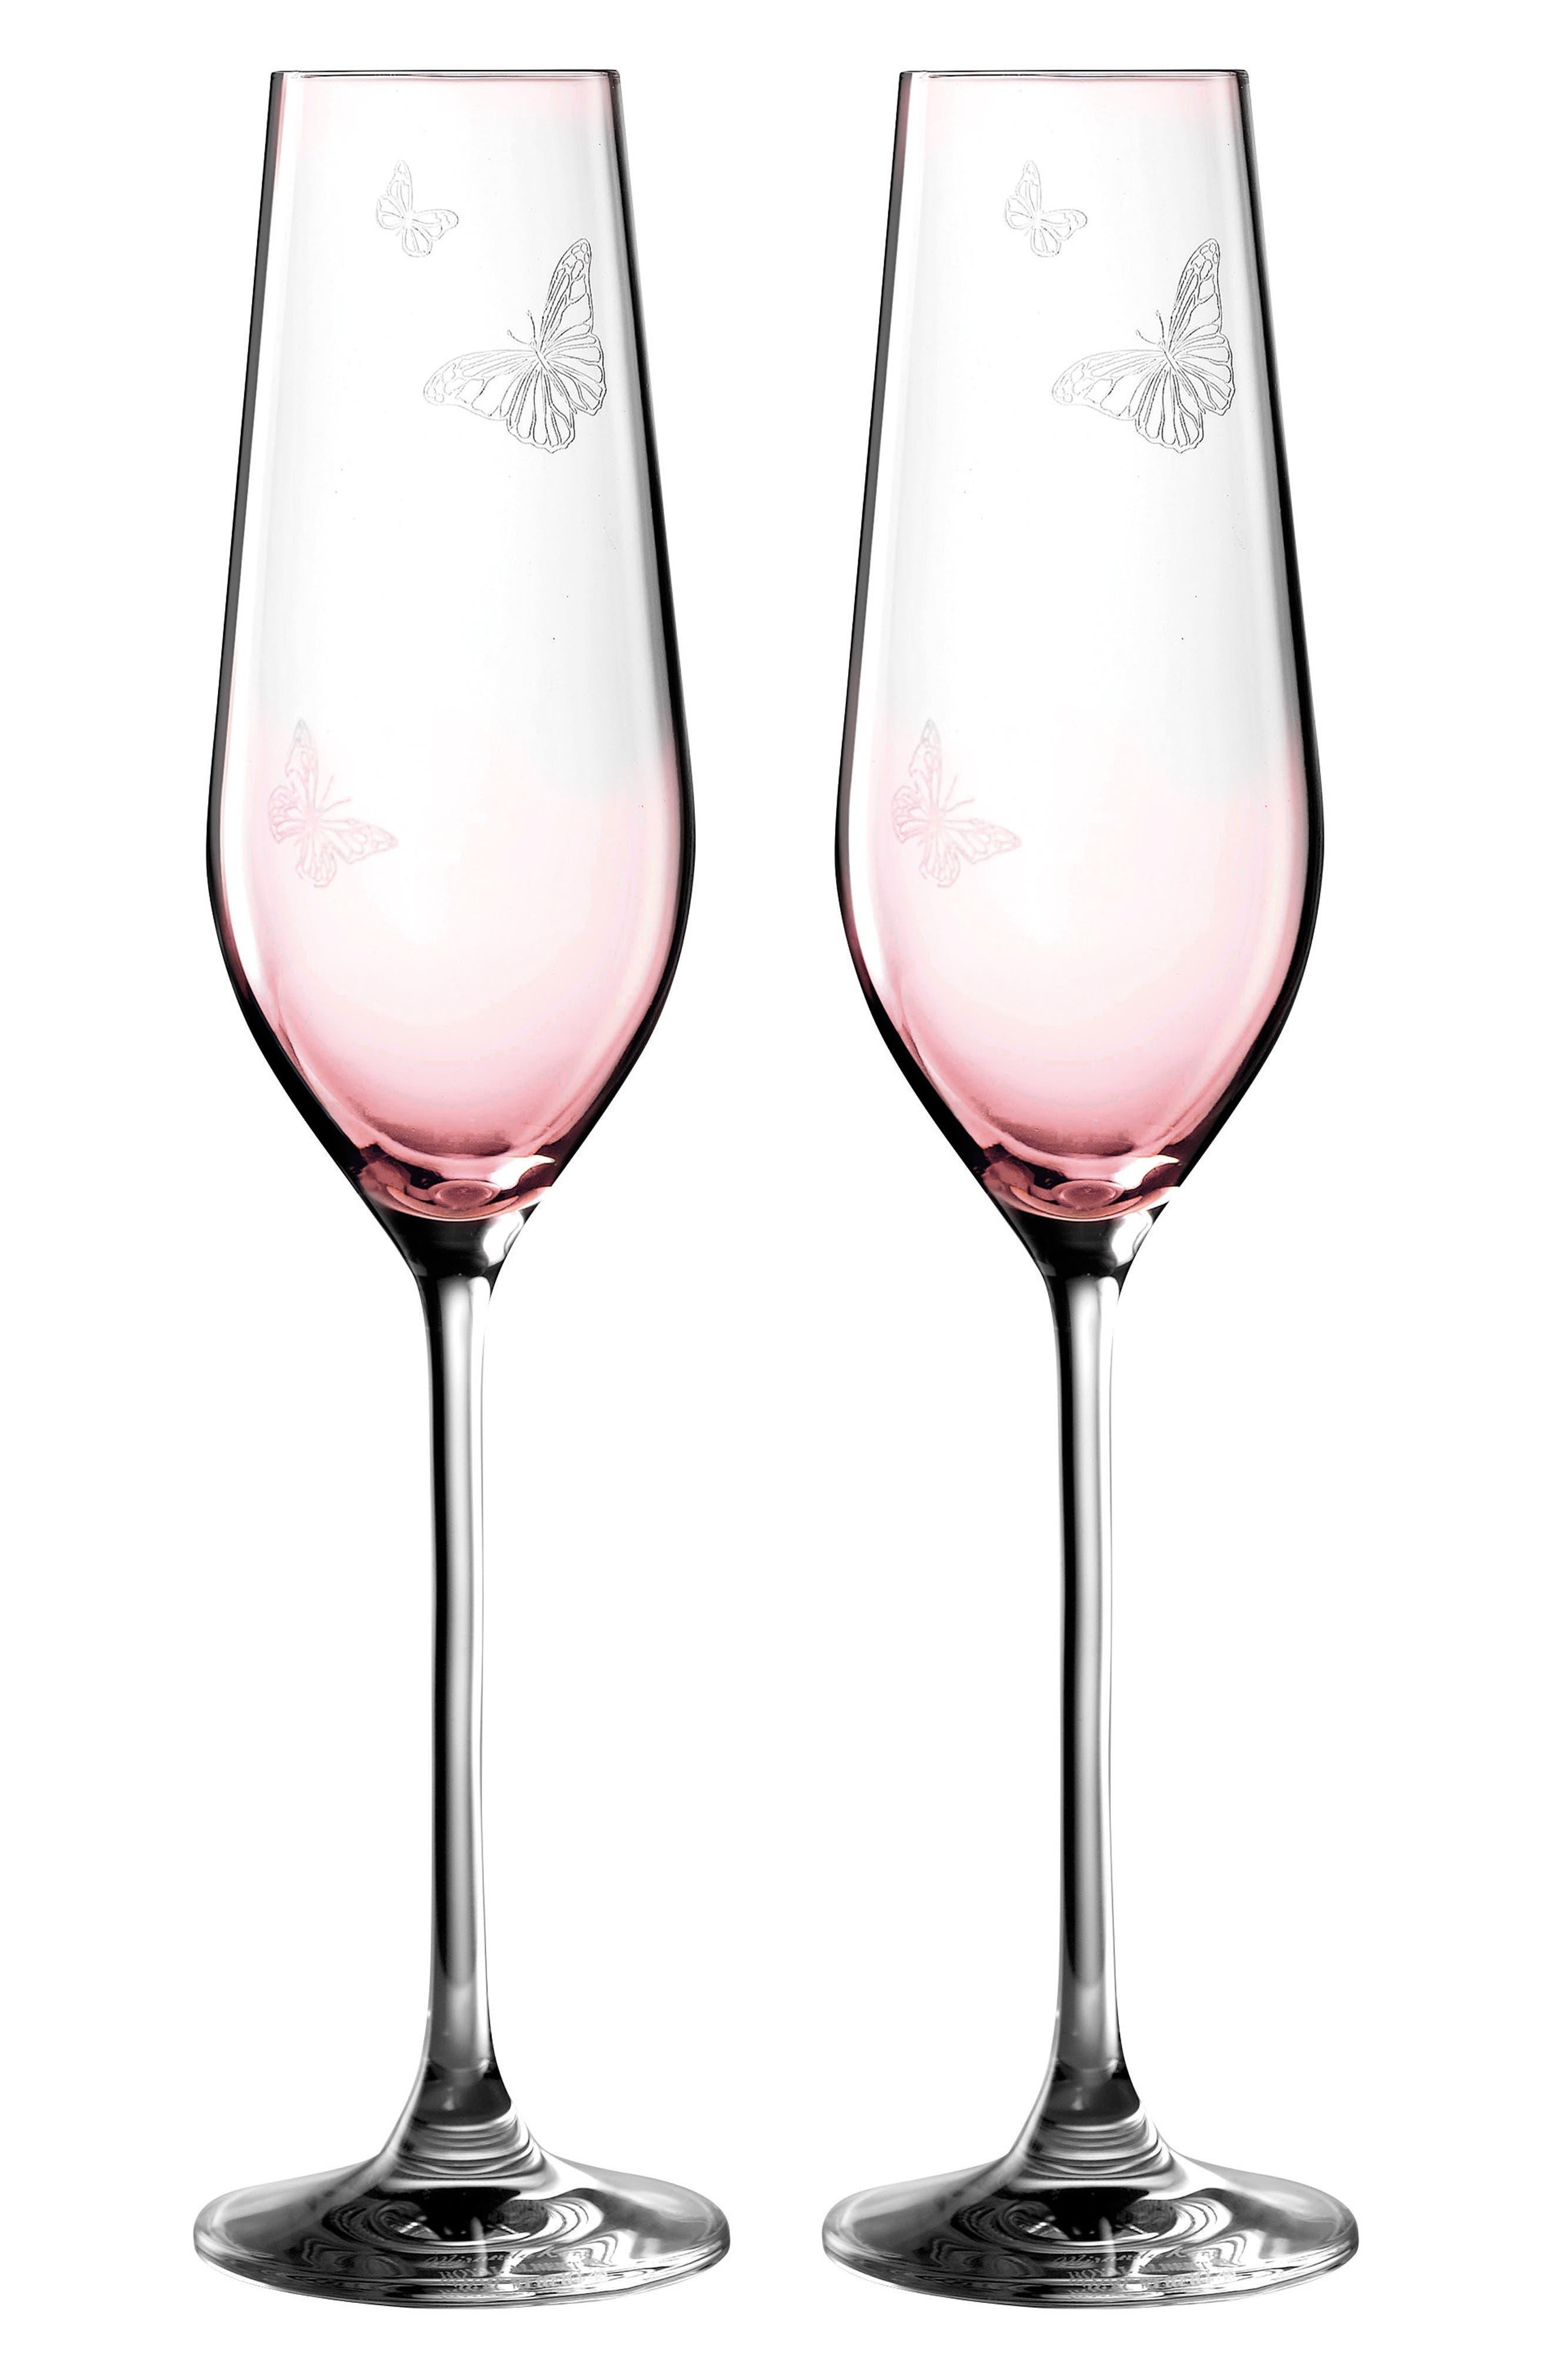 Miranda Kerr for Royal Albert Friendship Set of 2 Champagne Flutes